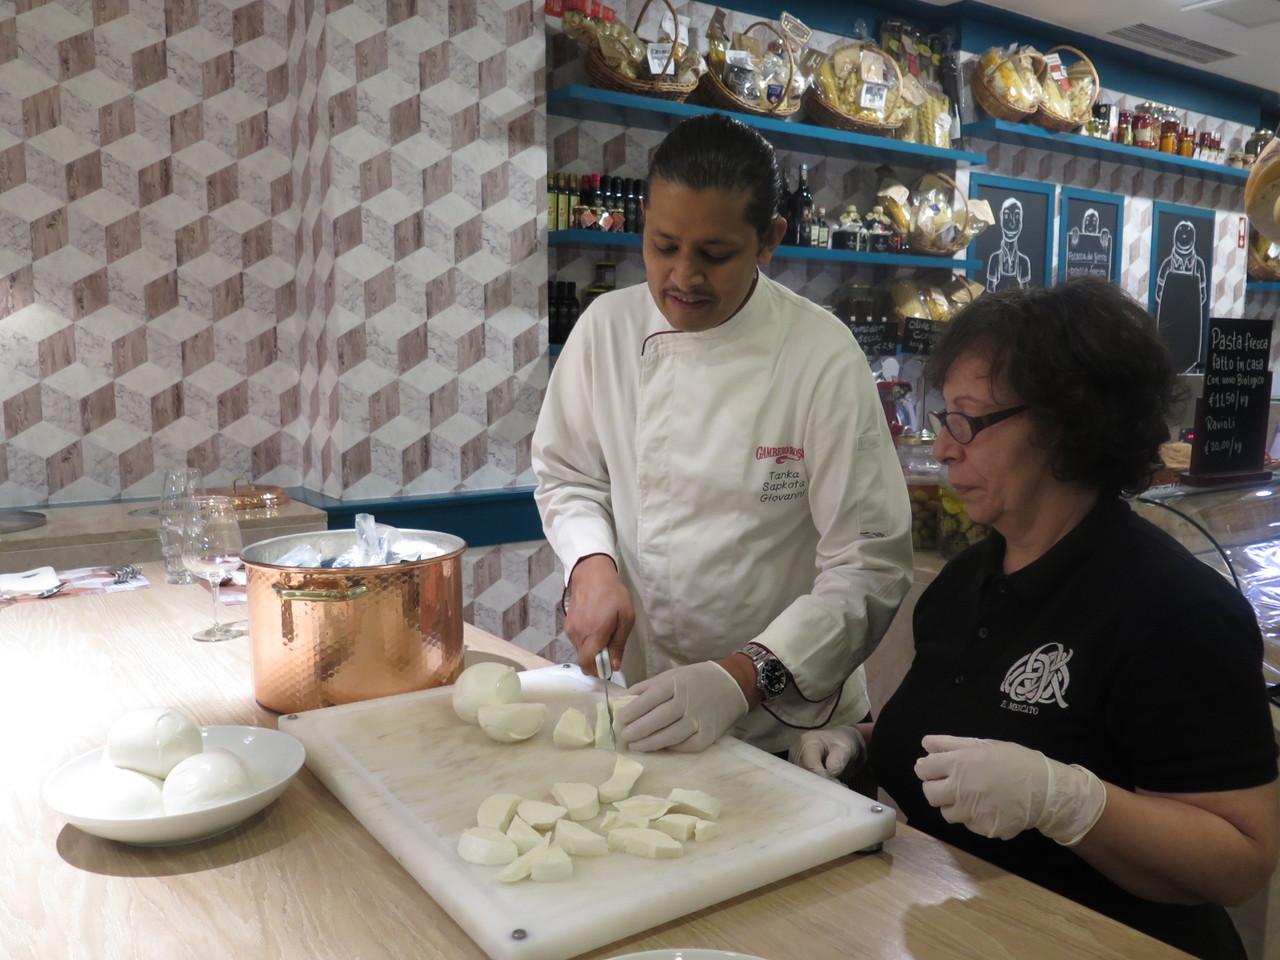 Na mesa comunal, Tanka Sapkota e a mozzarella de búfala